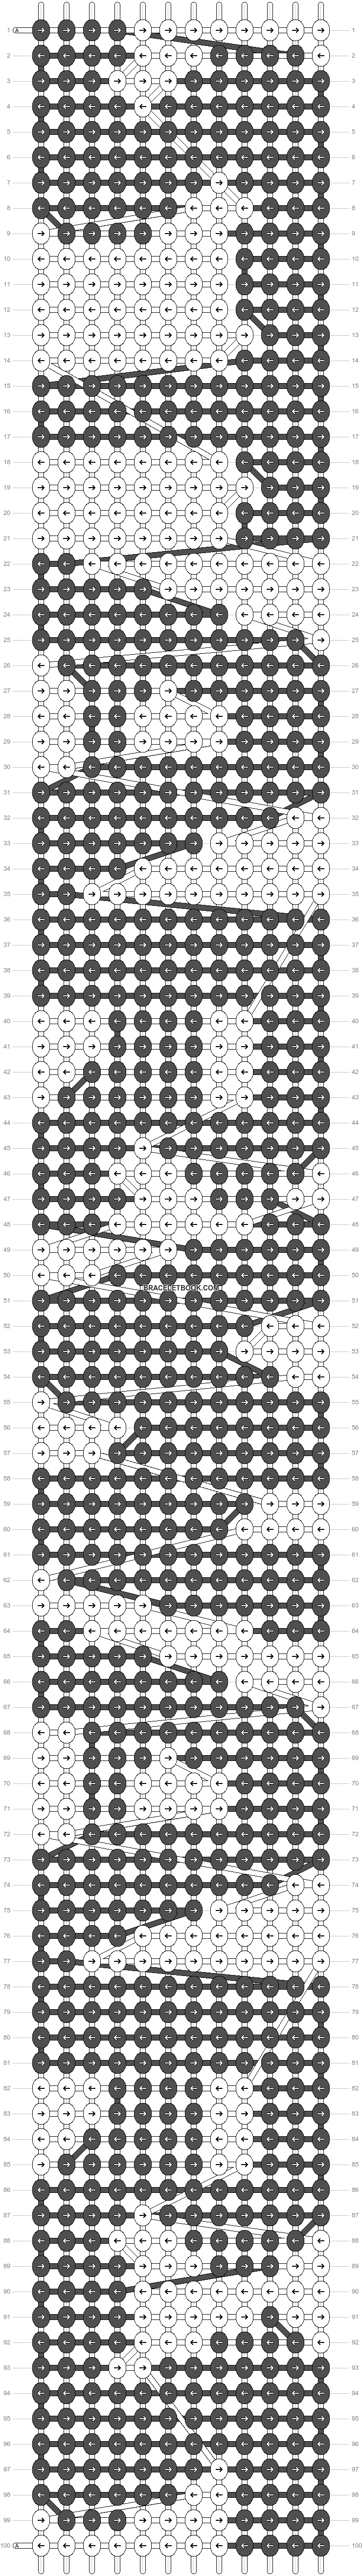 Alpha pattern #16721 pattern